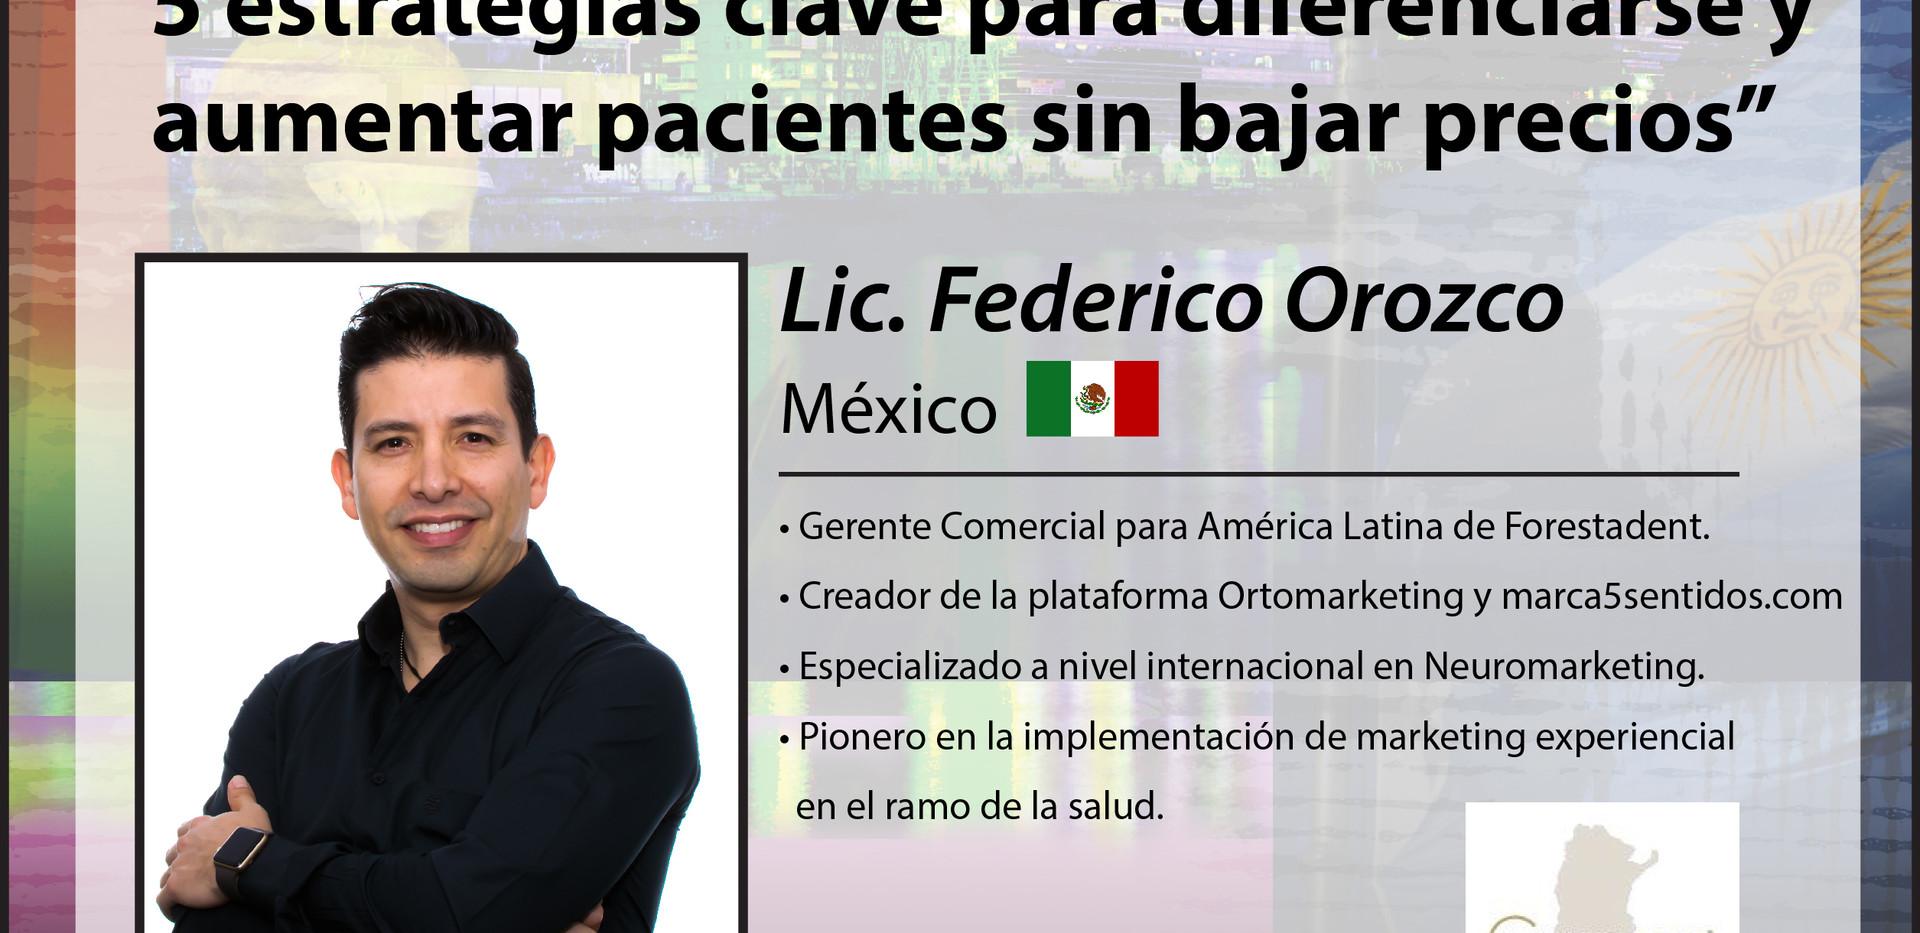 Lic. Federico Orozco